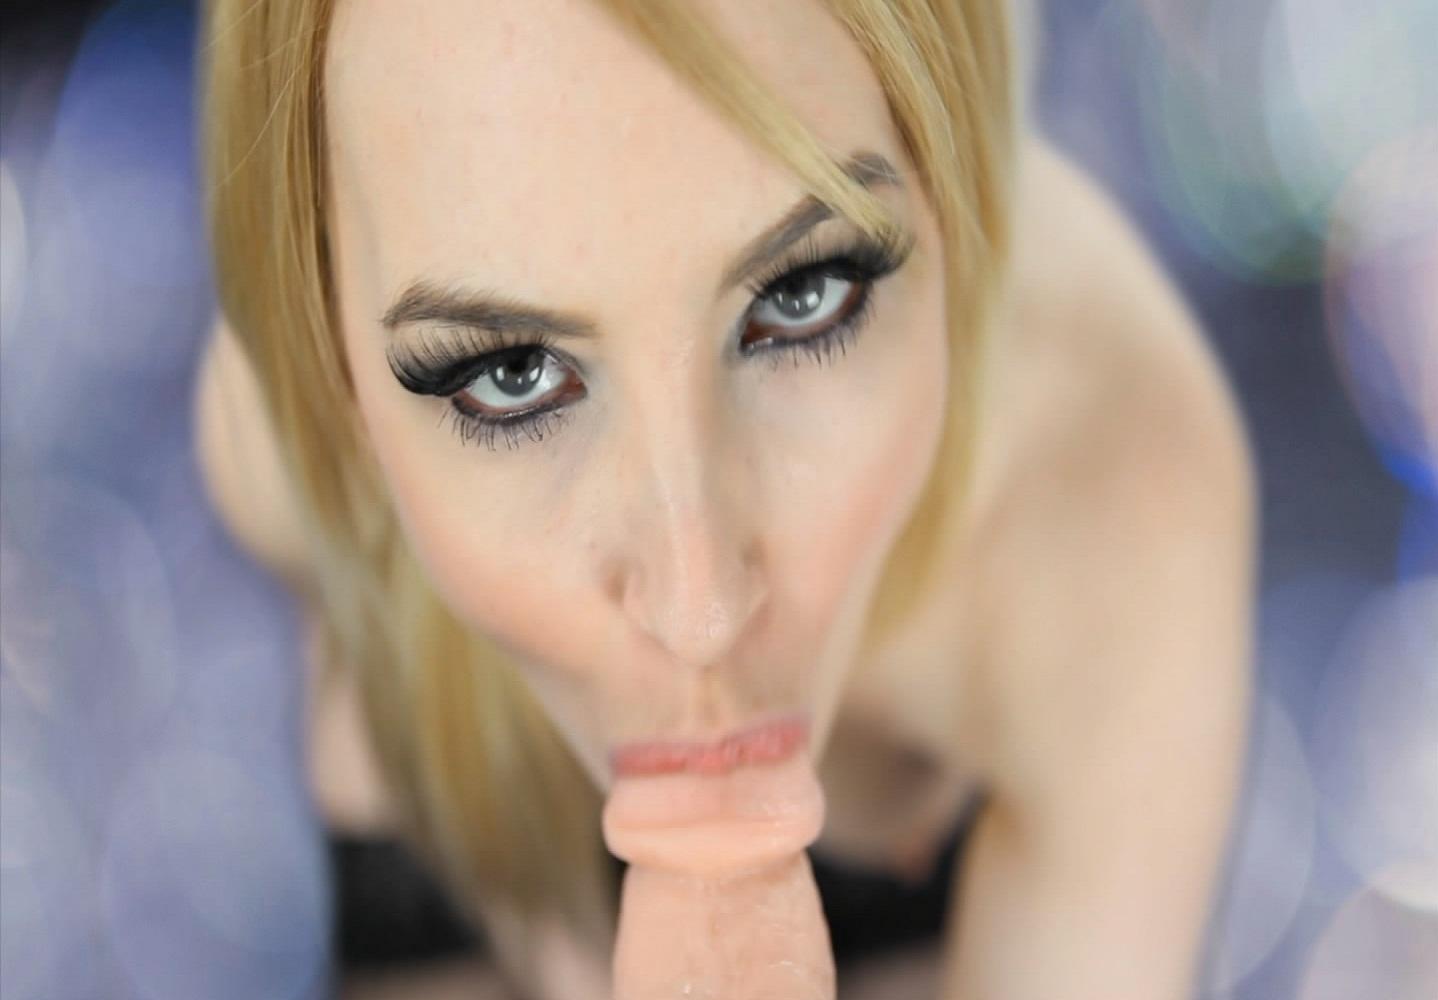 Tight dress blowjob porn tube